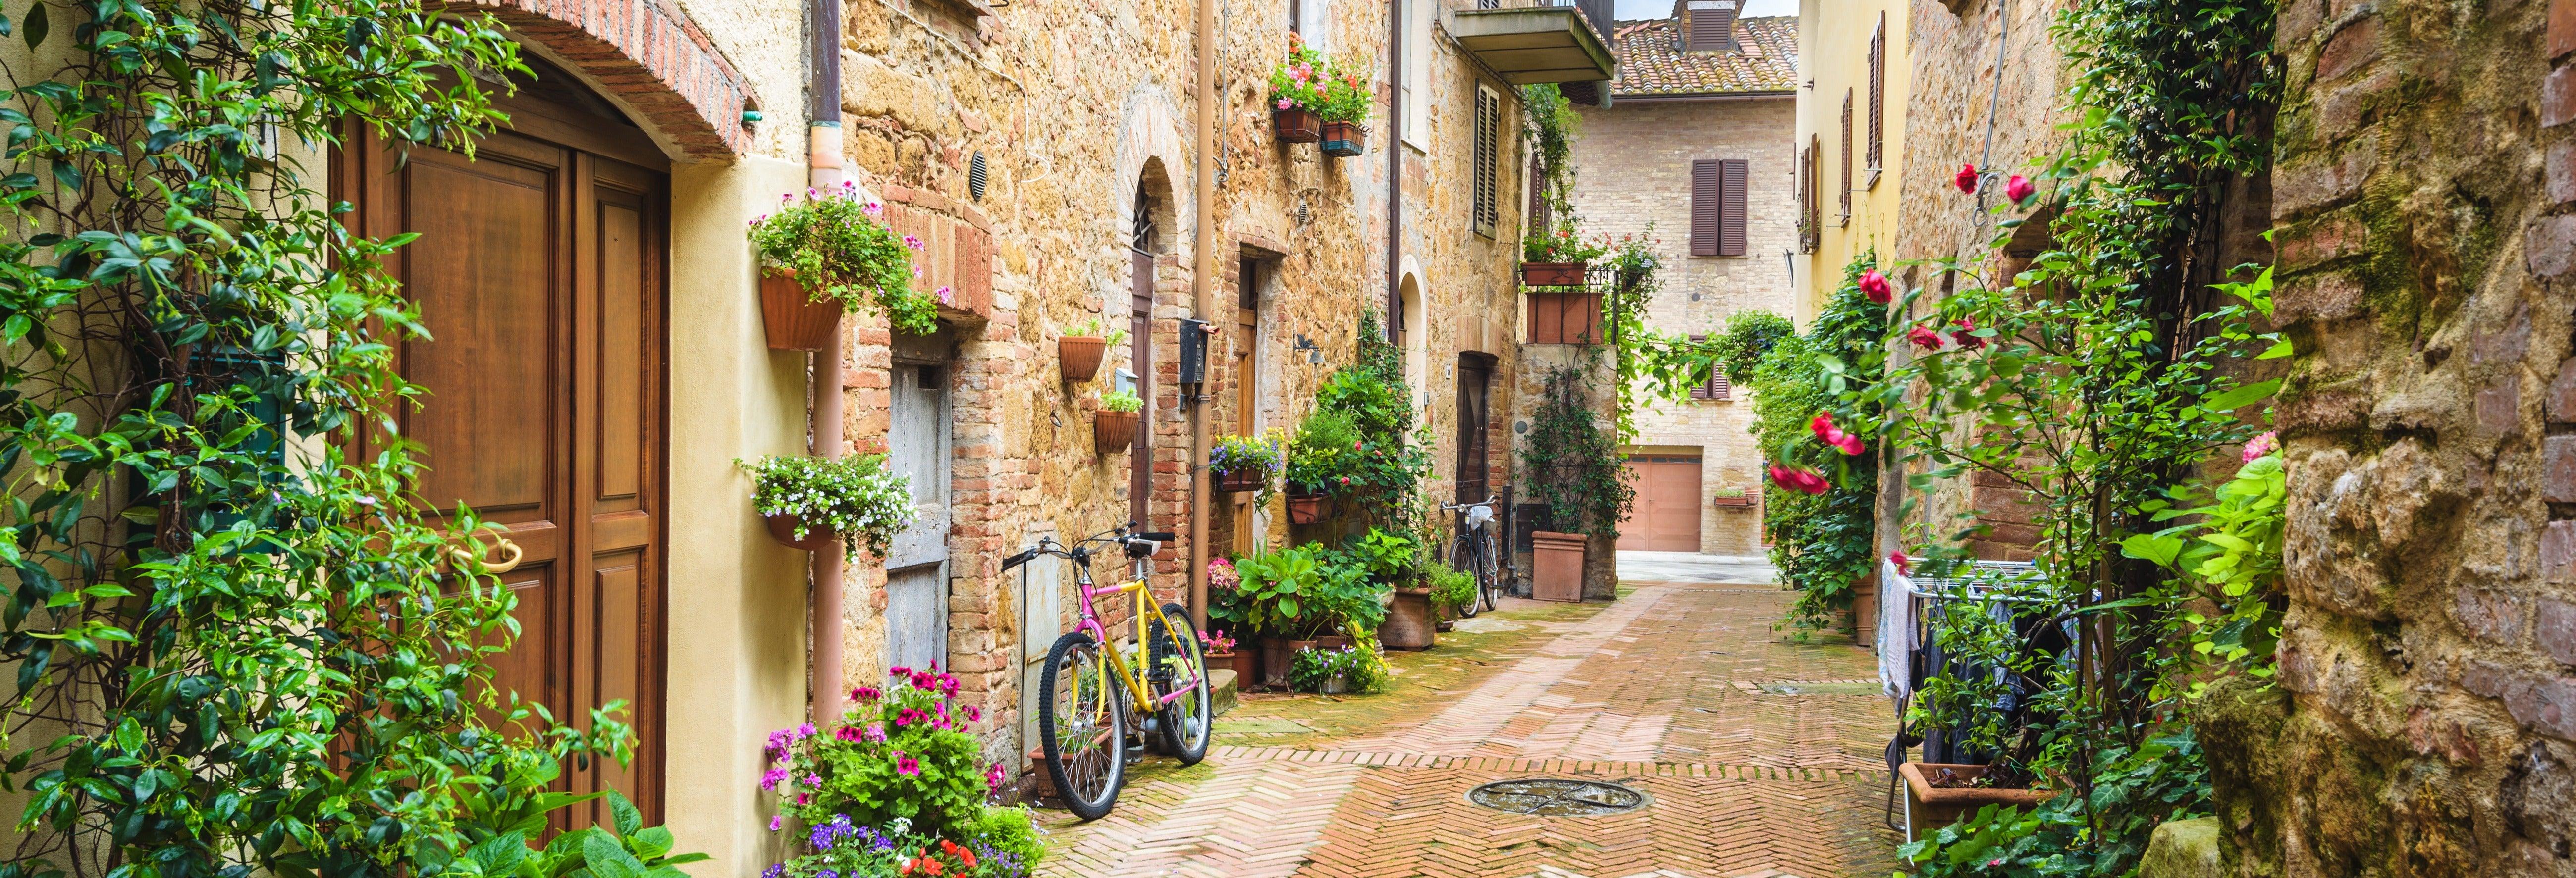 Tour a Montalcino, Pienza e Montepulciano